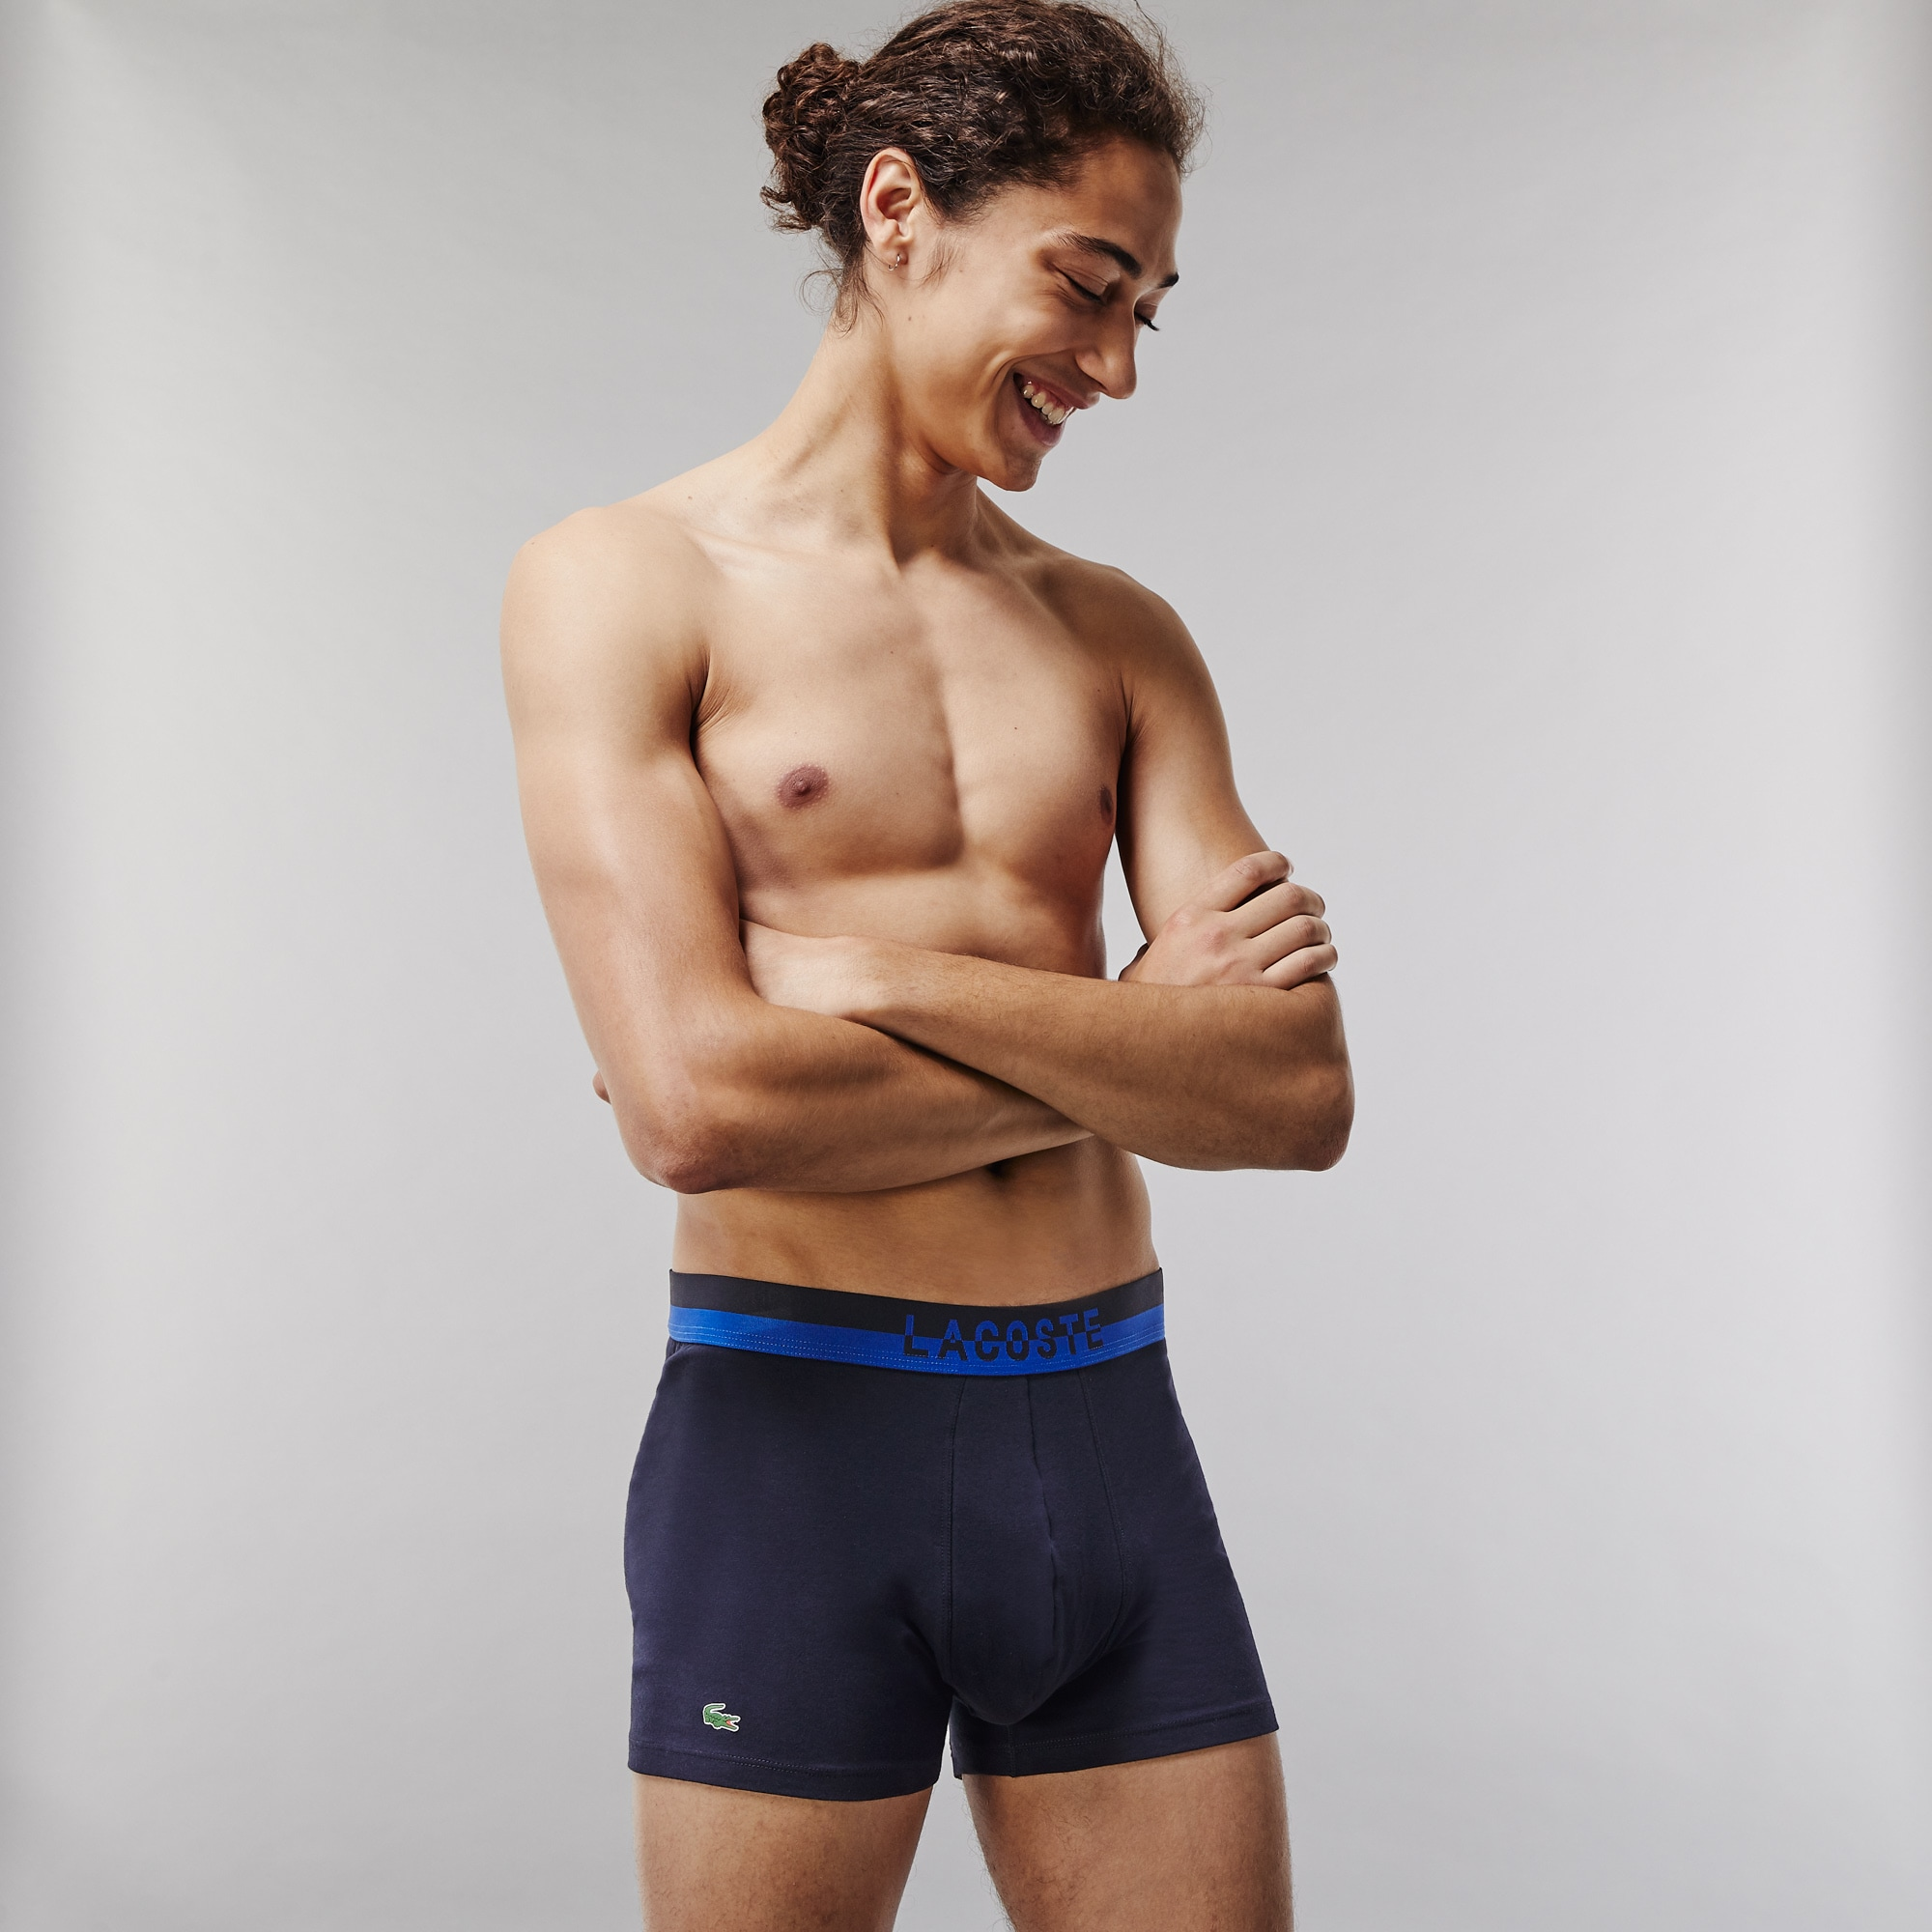 Plain Waistband 3 Mens Classic Sports Cotton Boxer Shorts Trunks Underwear